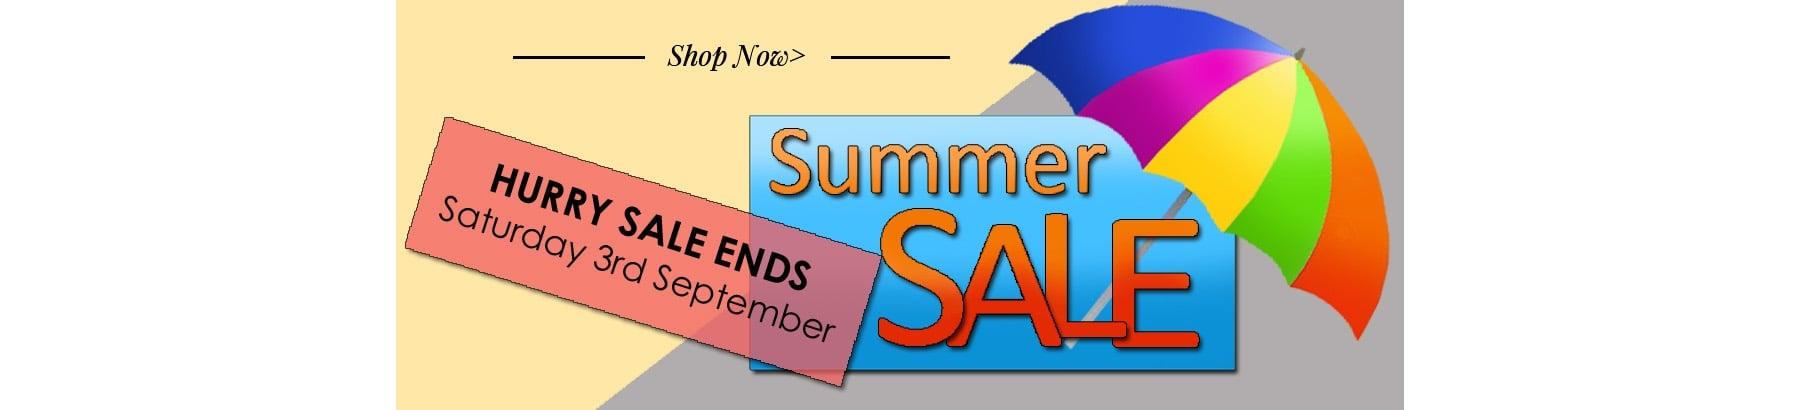 Sales Ends